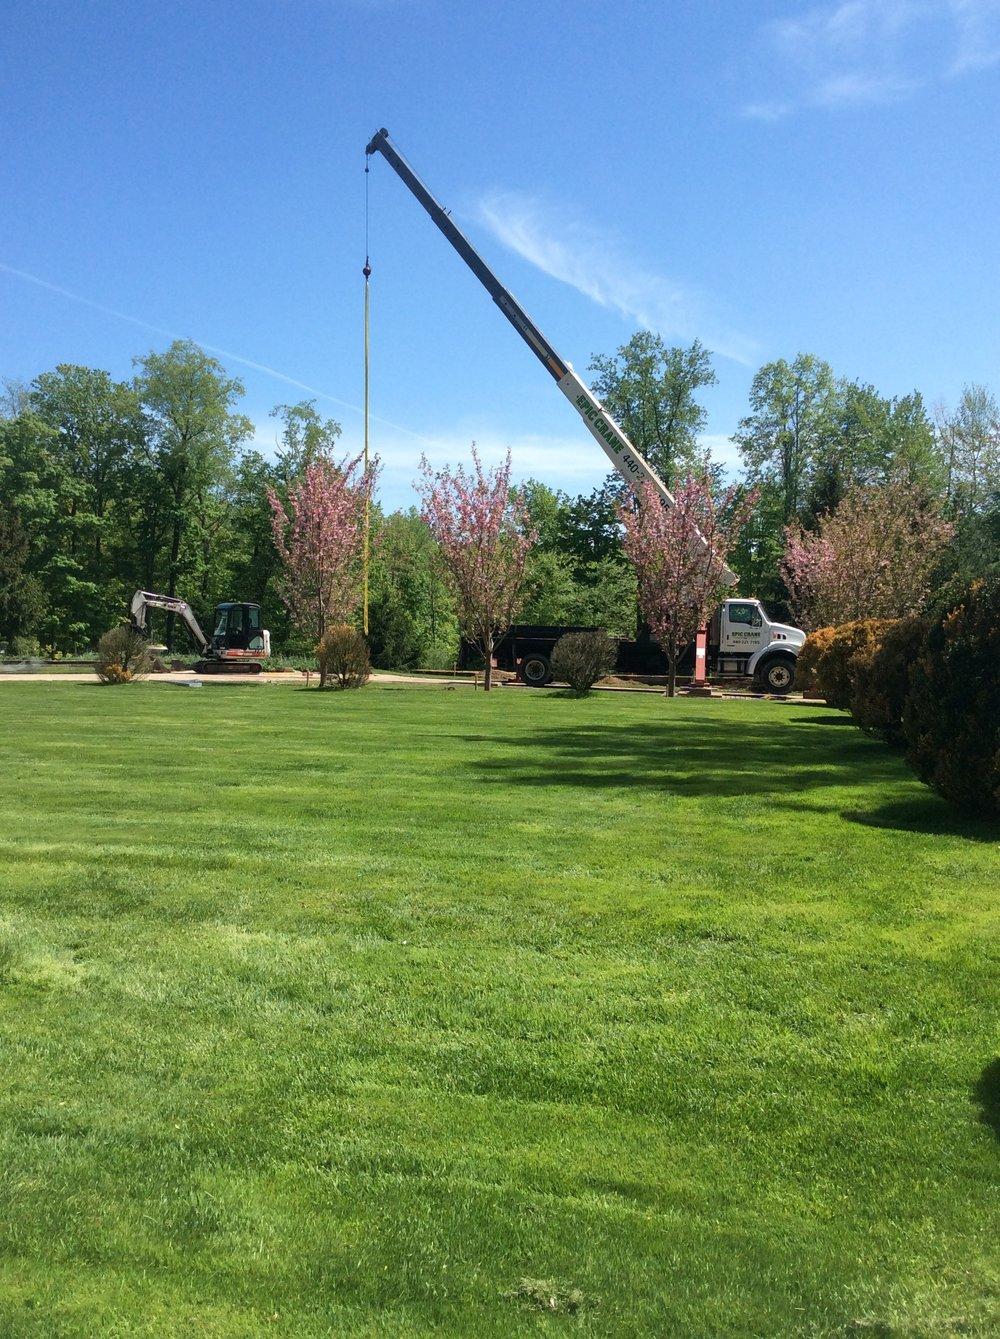 Unilock tree care company in Hudson, OH